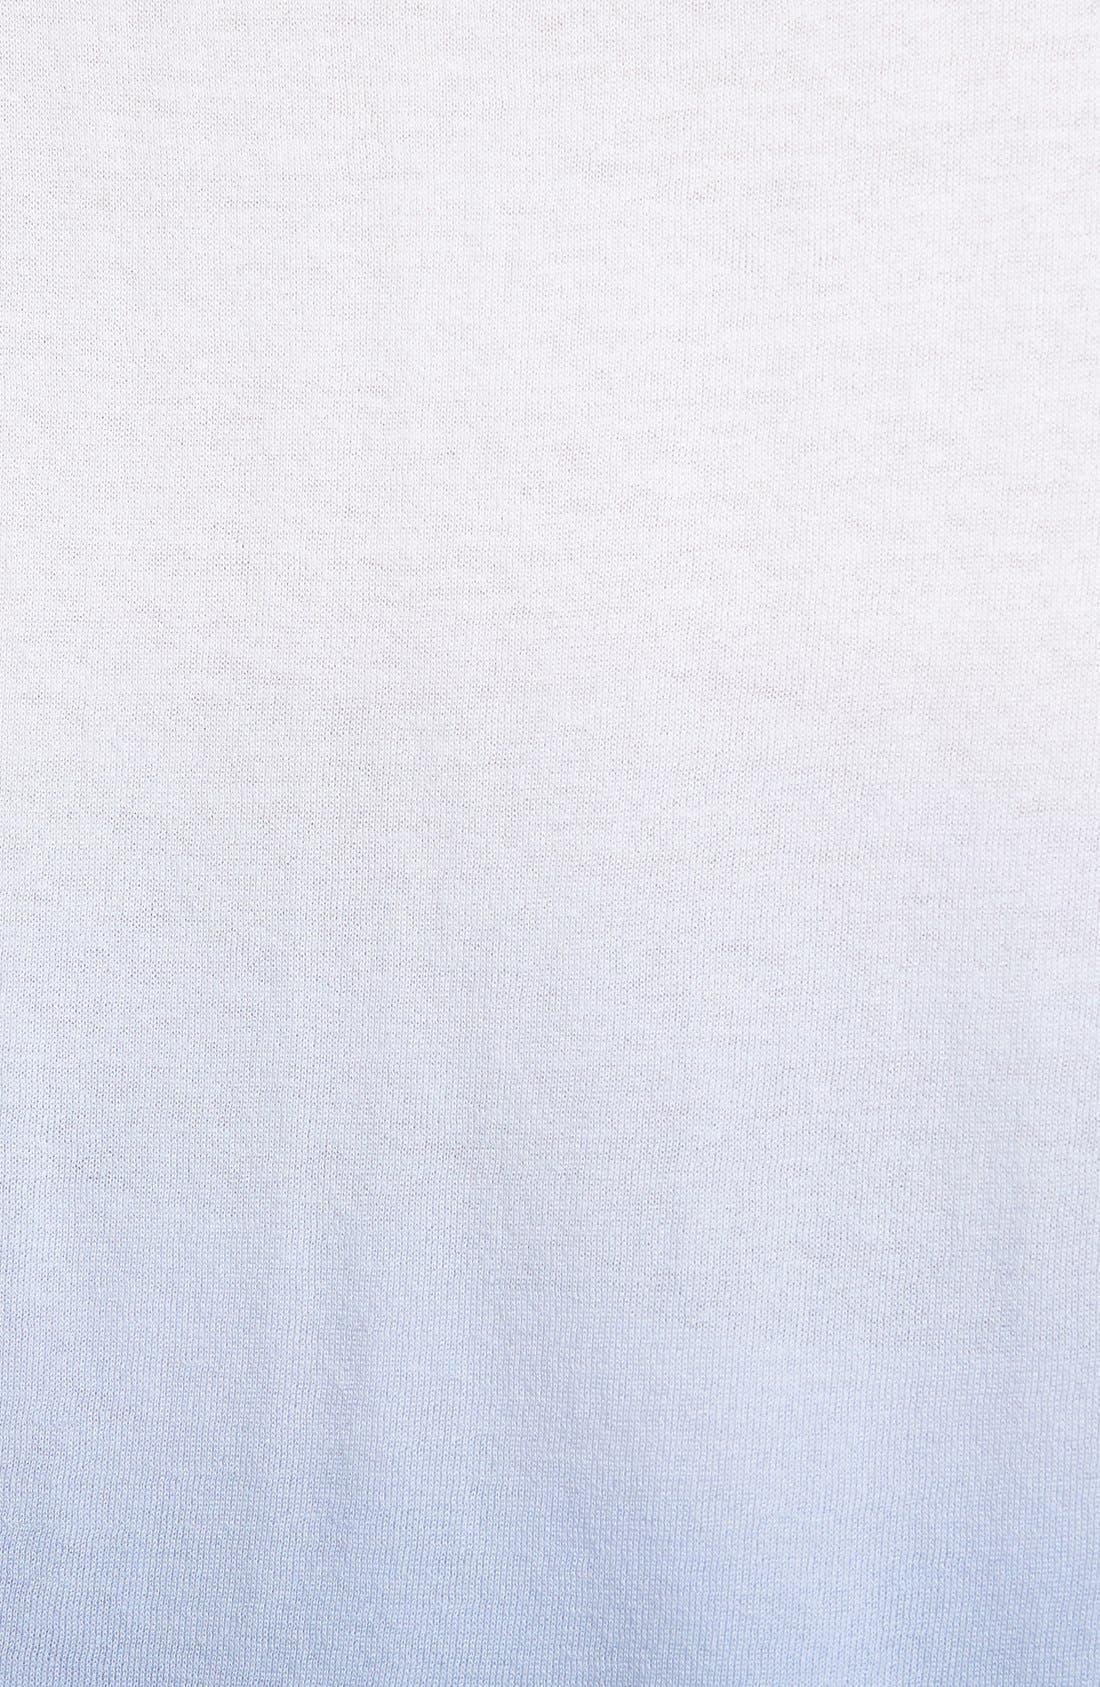 Alternate Image 3  - Nordstrom Collection 'Lula' Dip Dye Cotton Blend Sweater